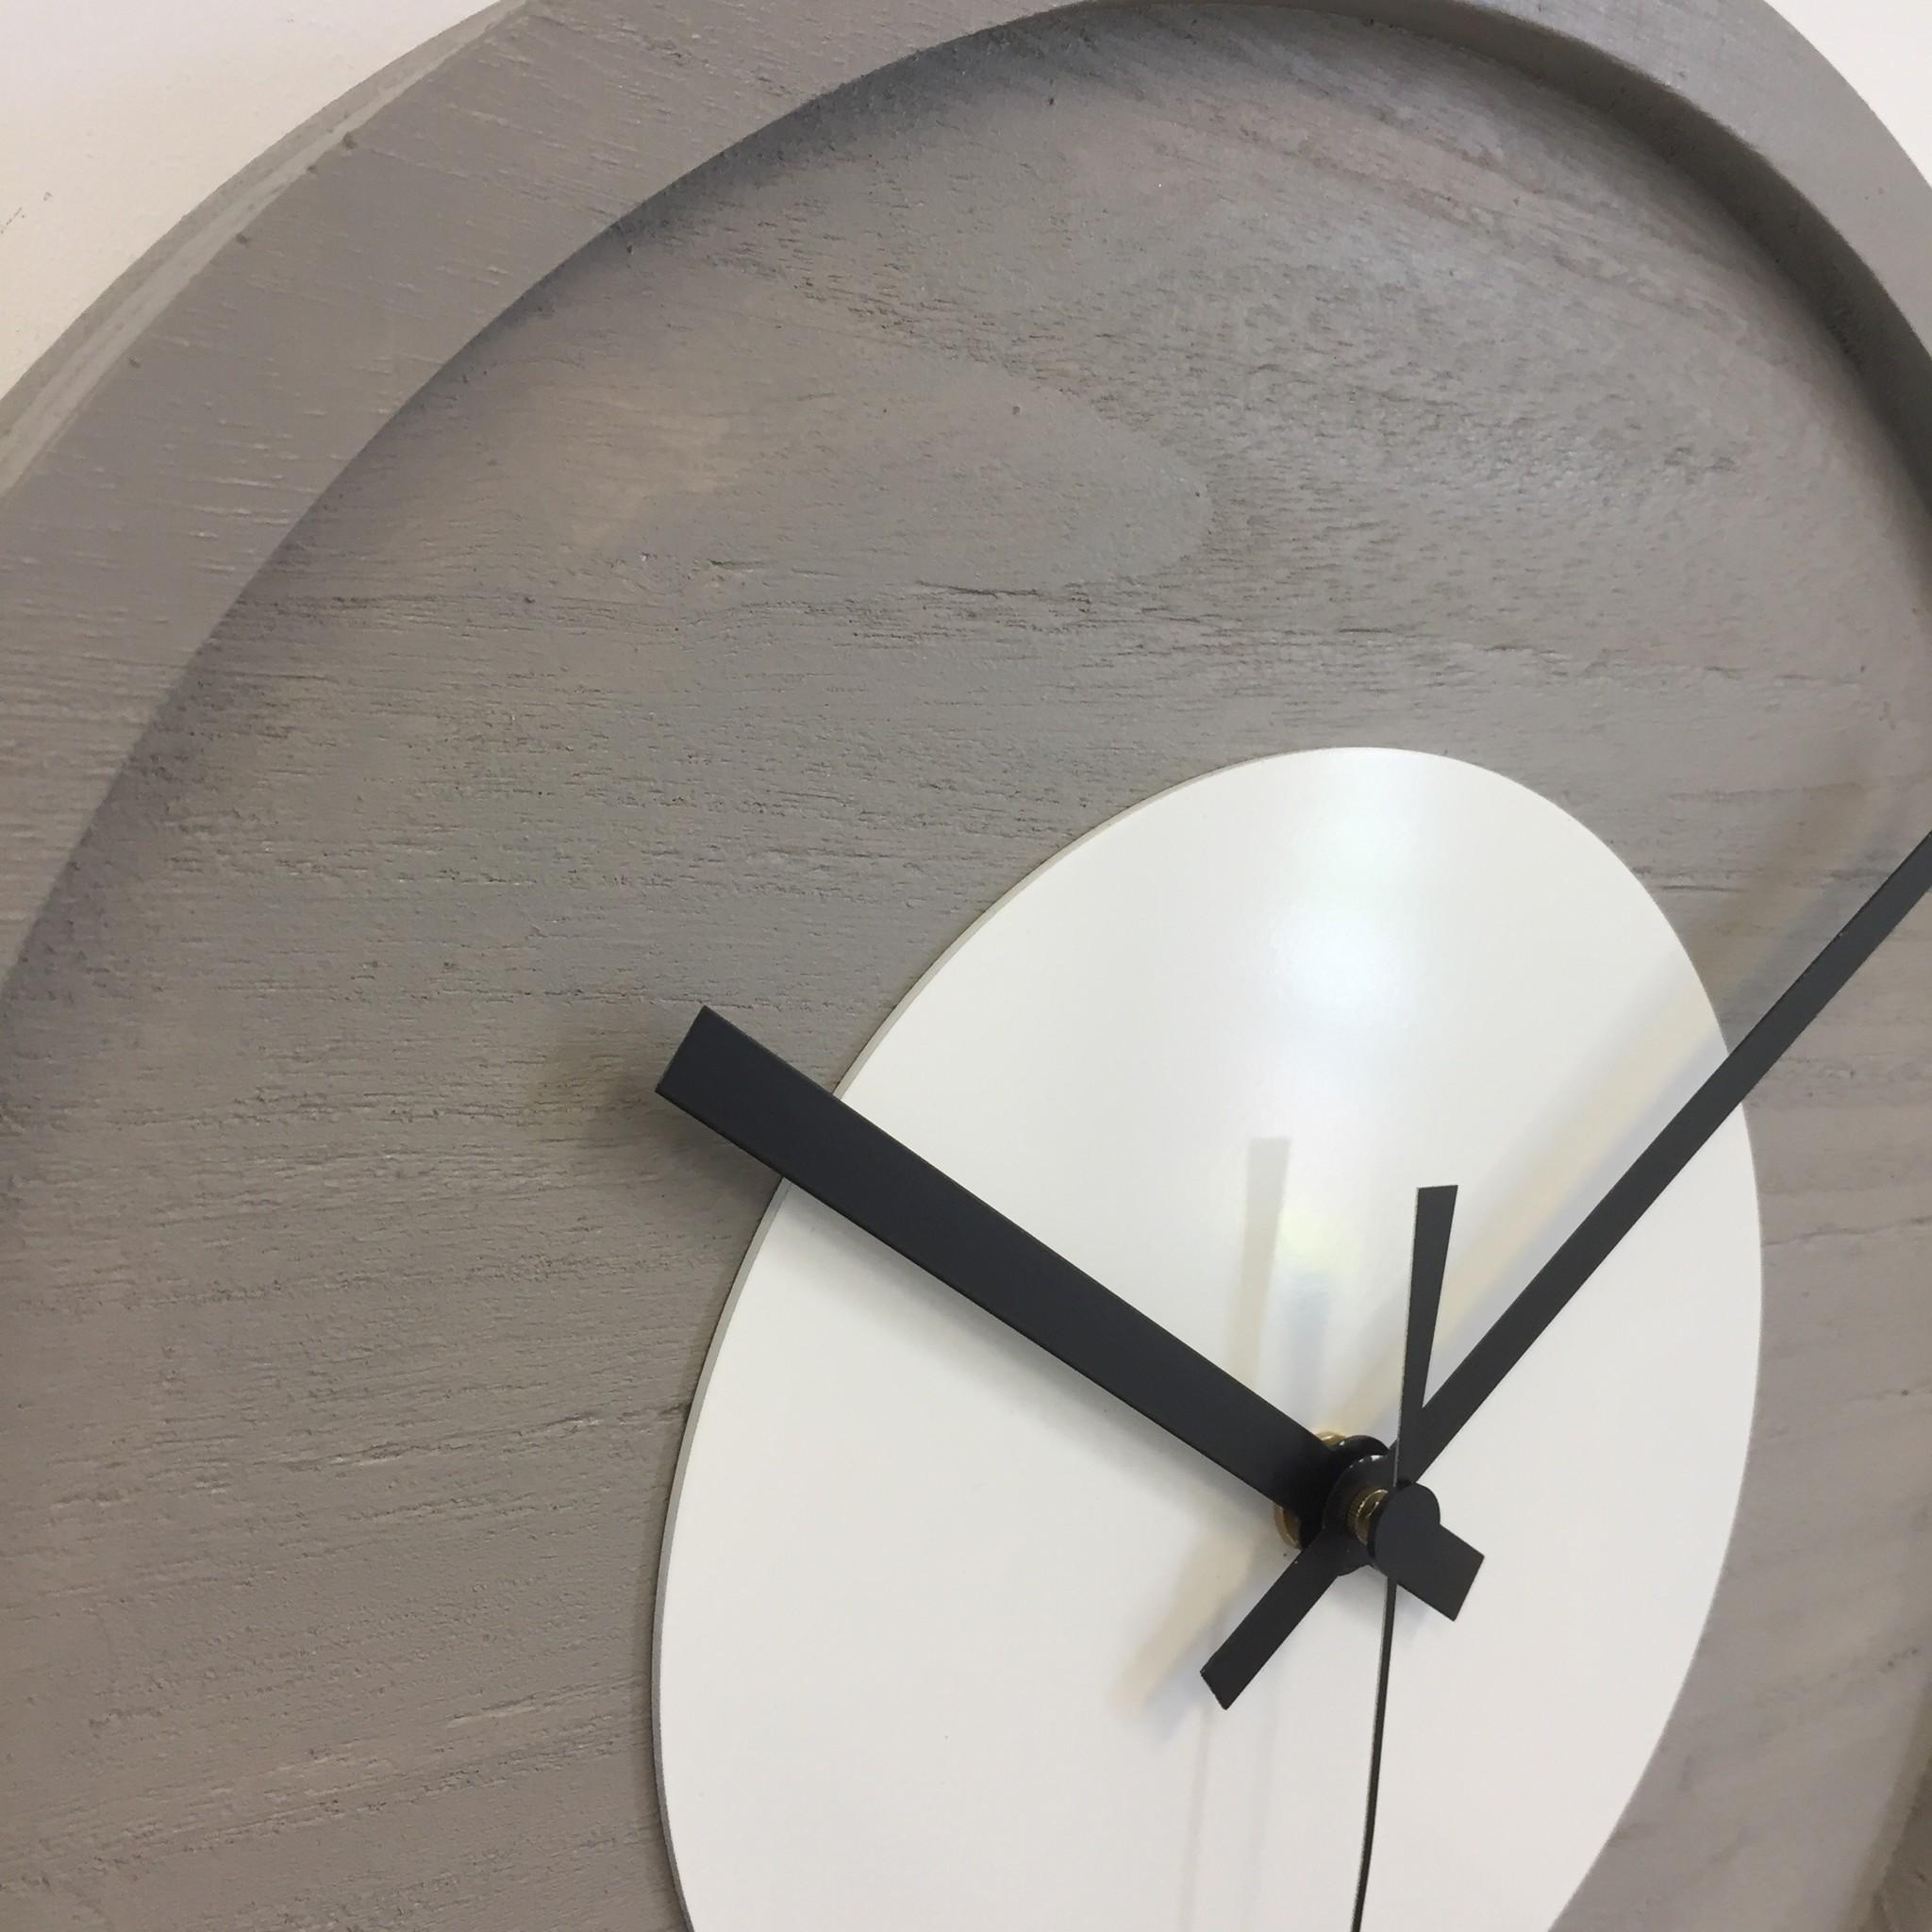 ChantalBrandO Wandklok Quinten White Modern Design